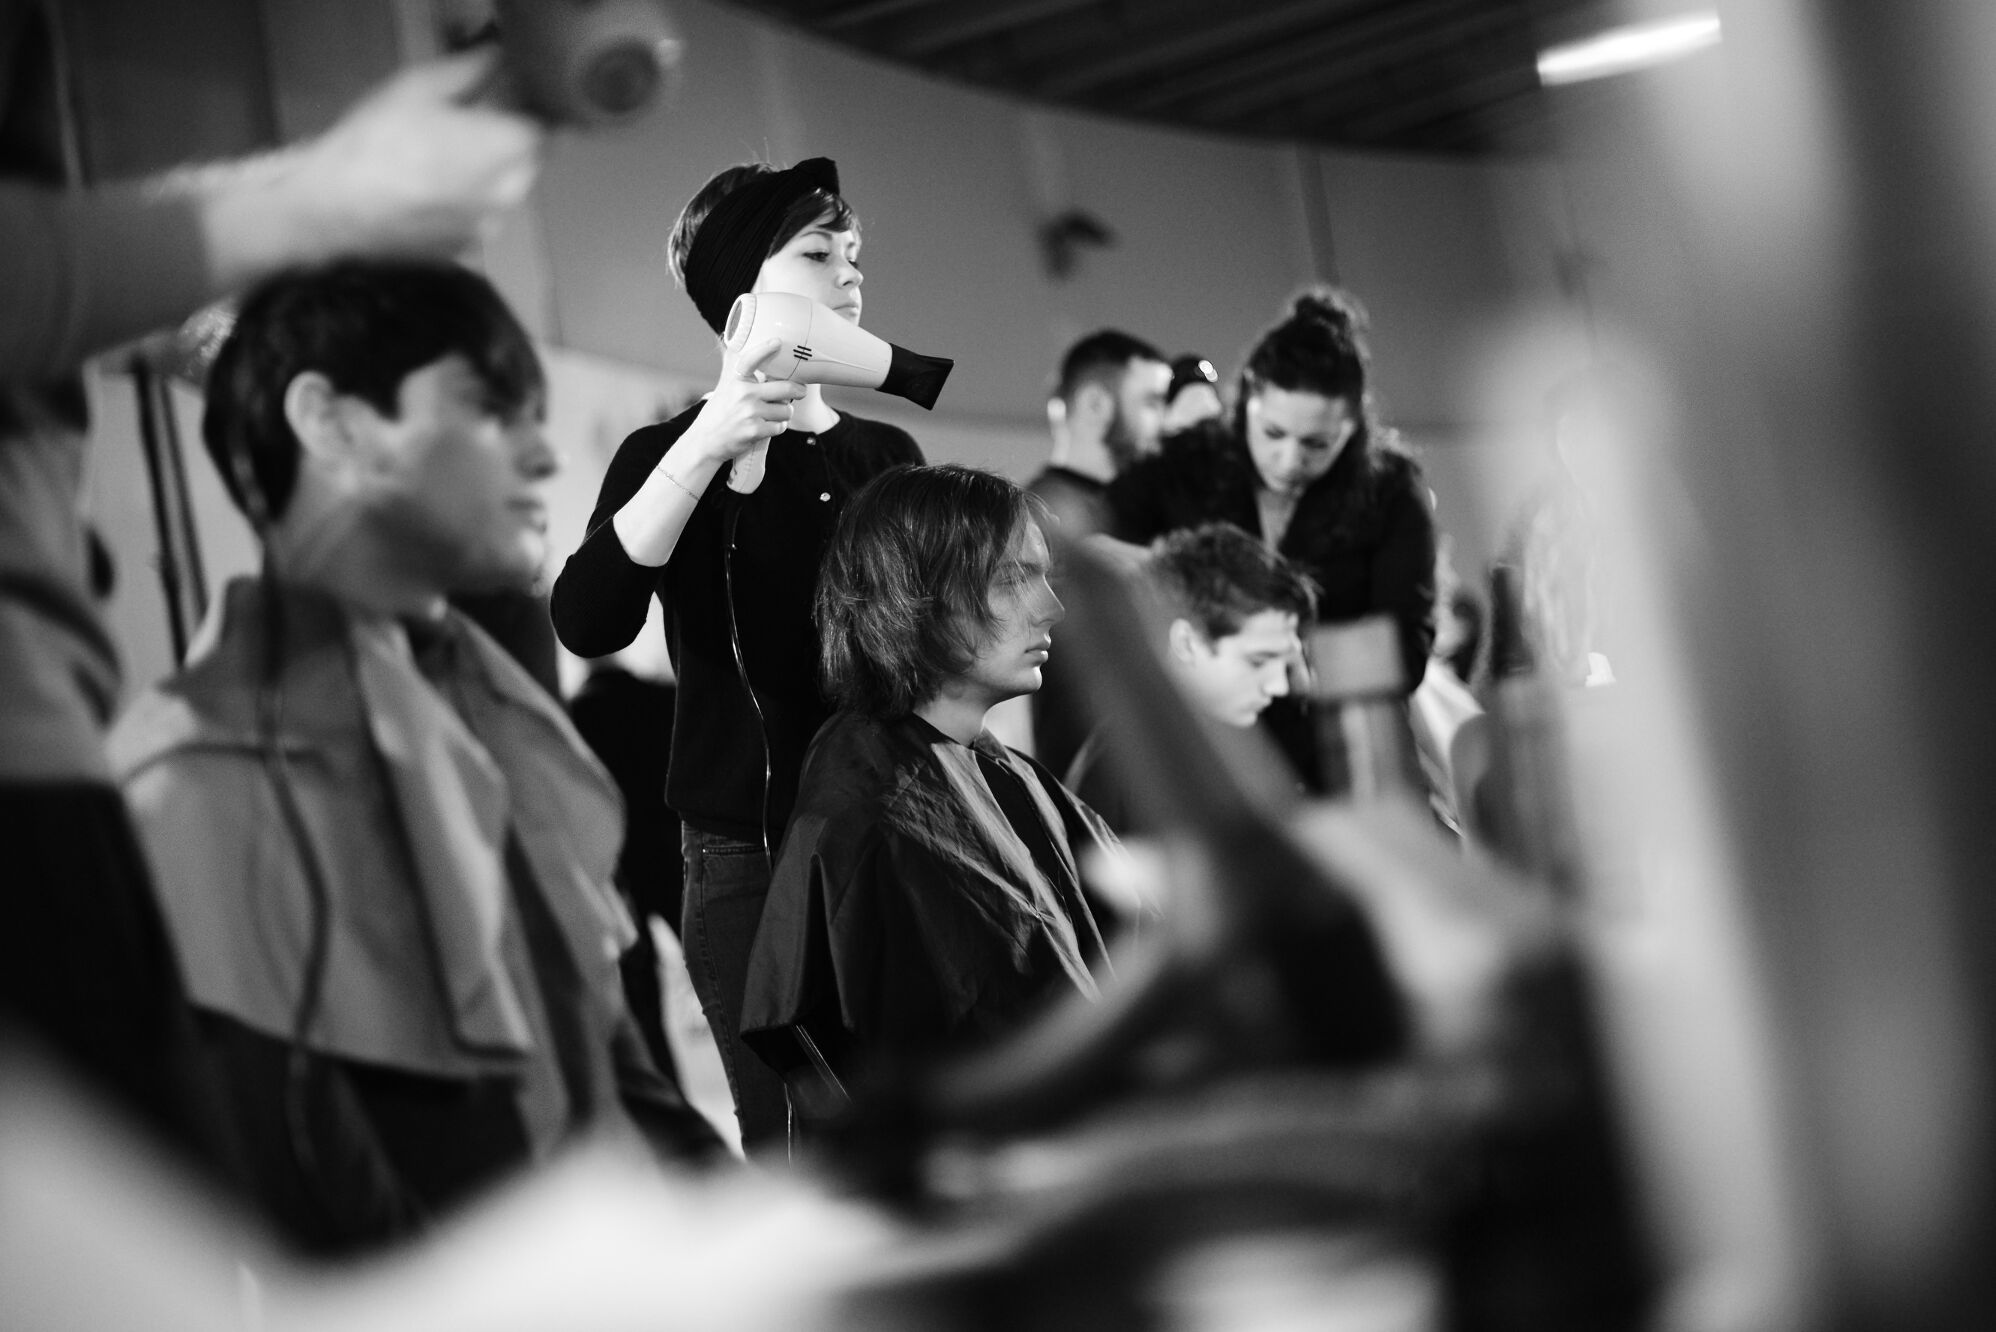 Backstage FW 2015 Hair Stylist Diesel Black Gold